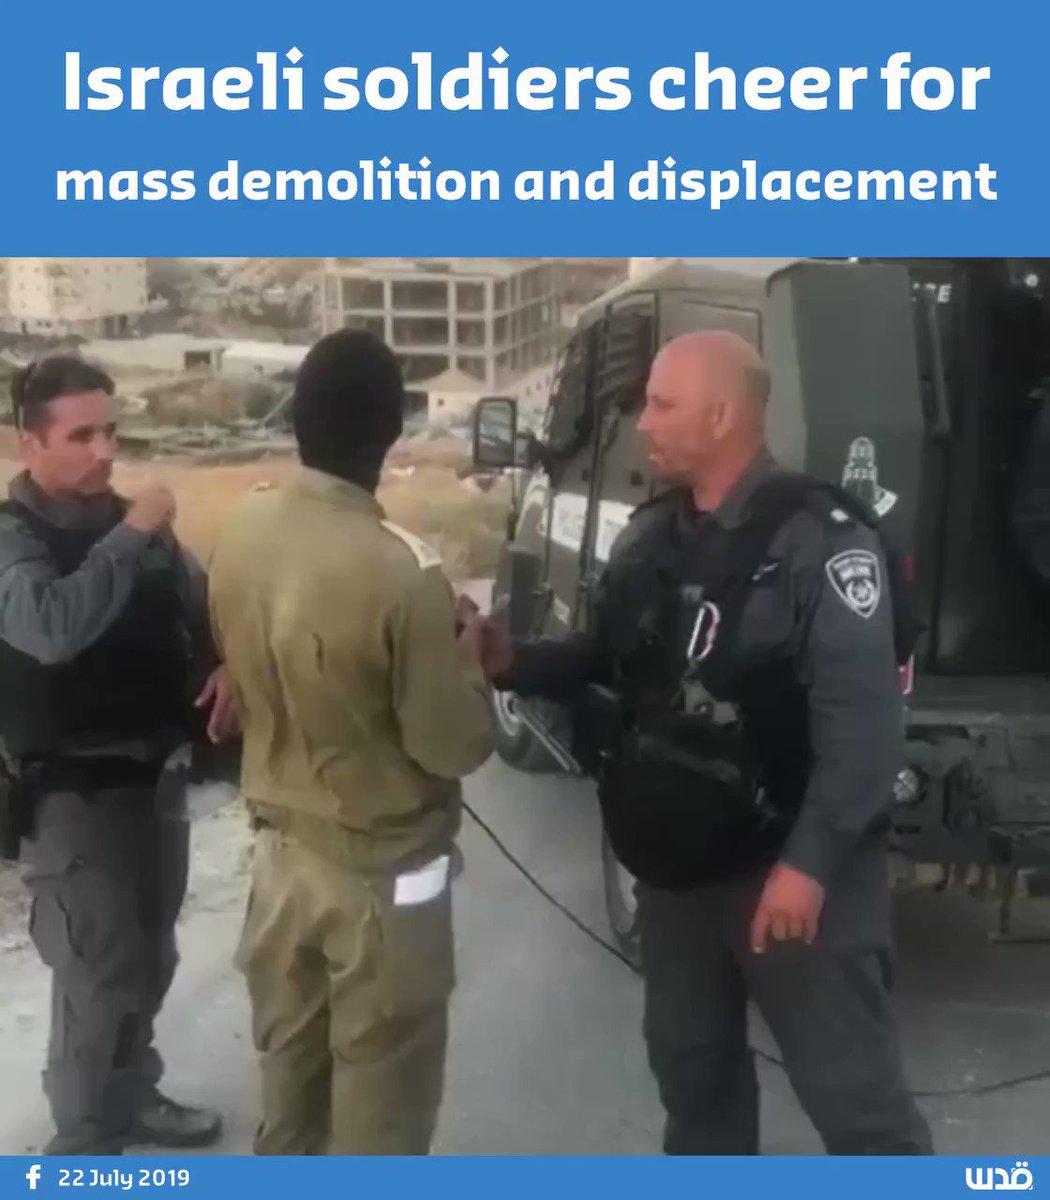 Wadi Hummus: Another Israeli celebration of ethnic cleansing